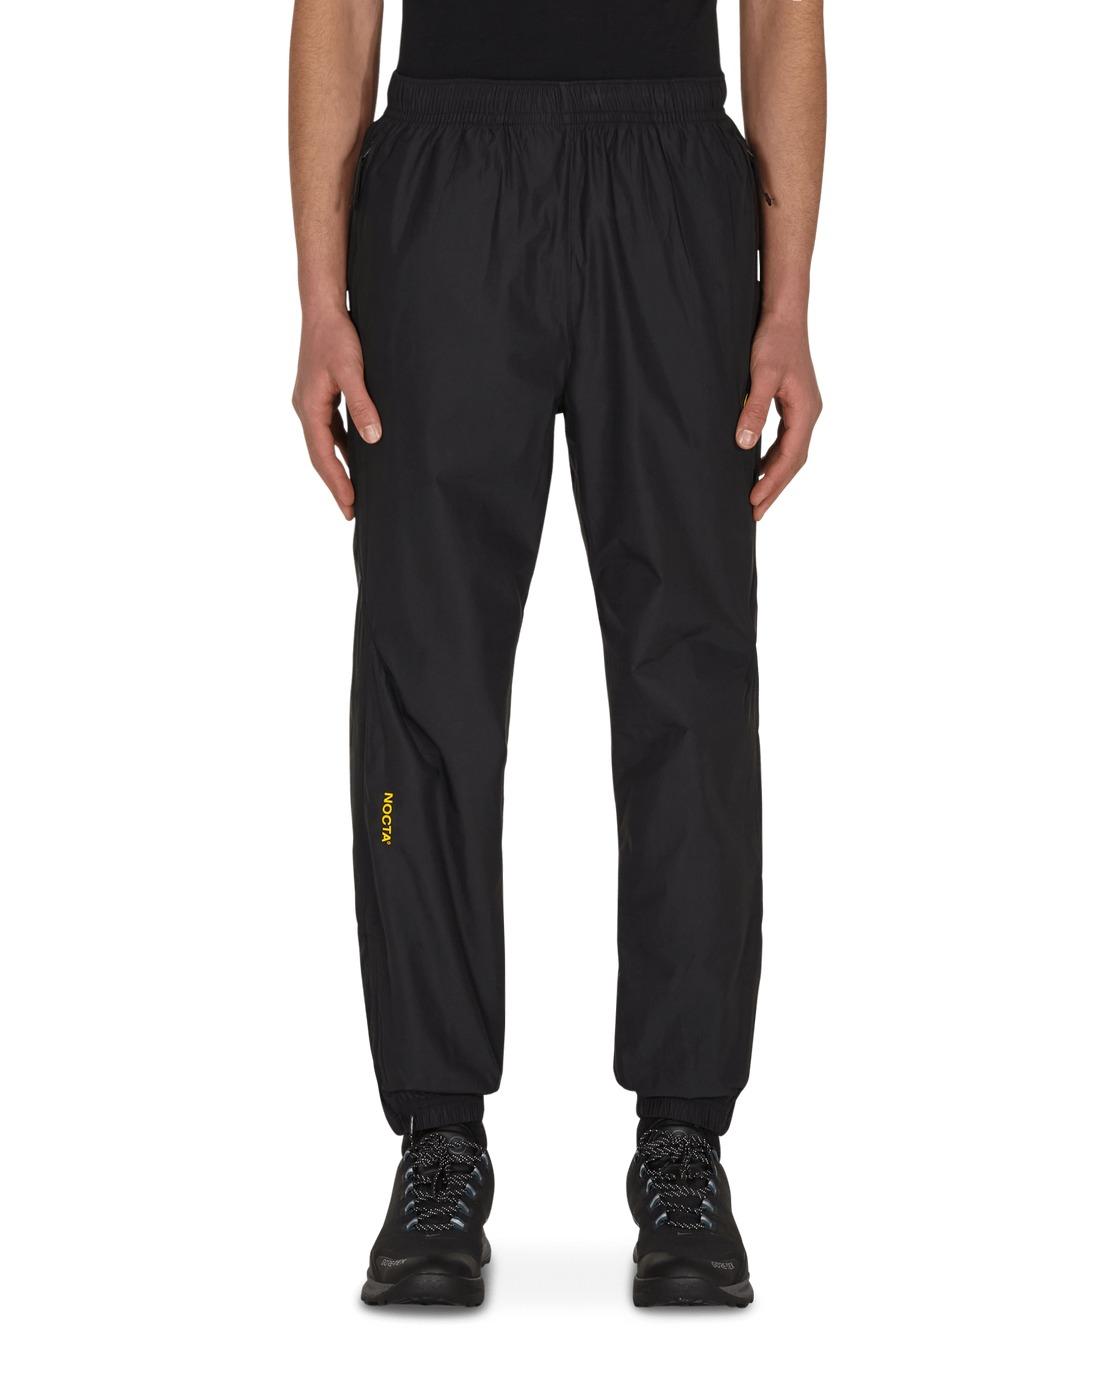 Nike Special Project Nocta Nrg Track Pants Black